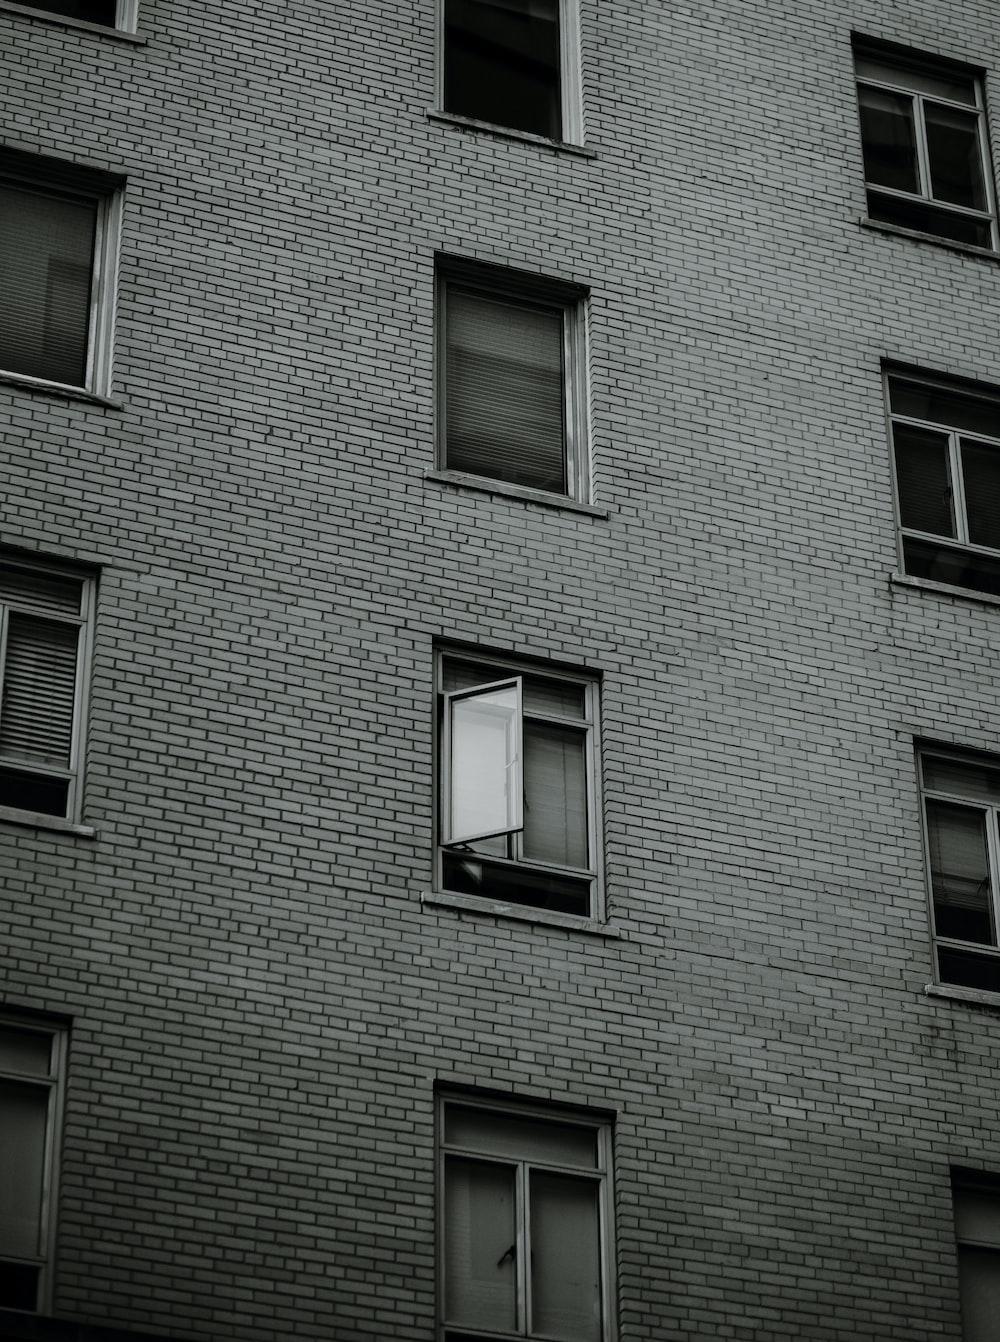 gray concrete building with windows